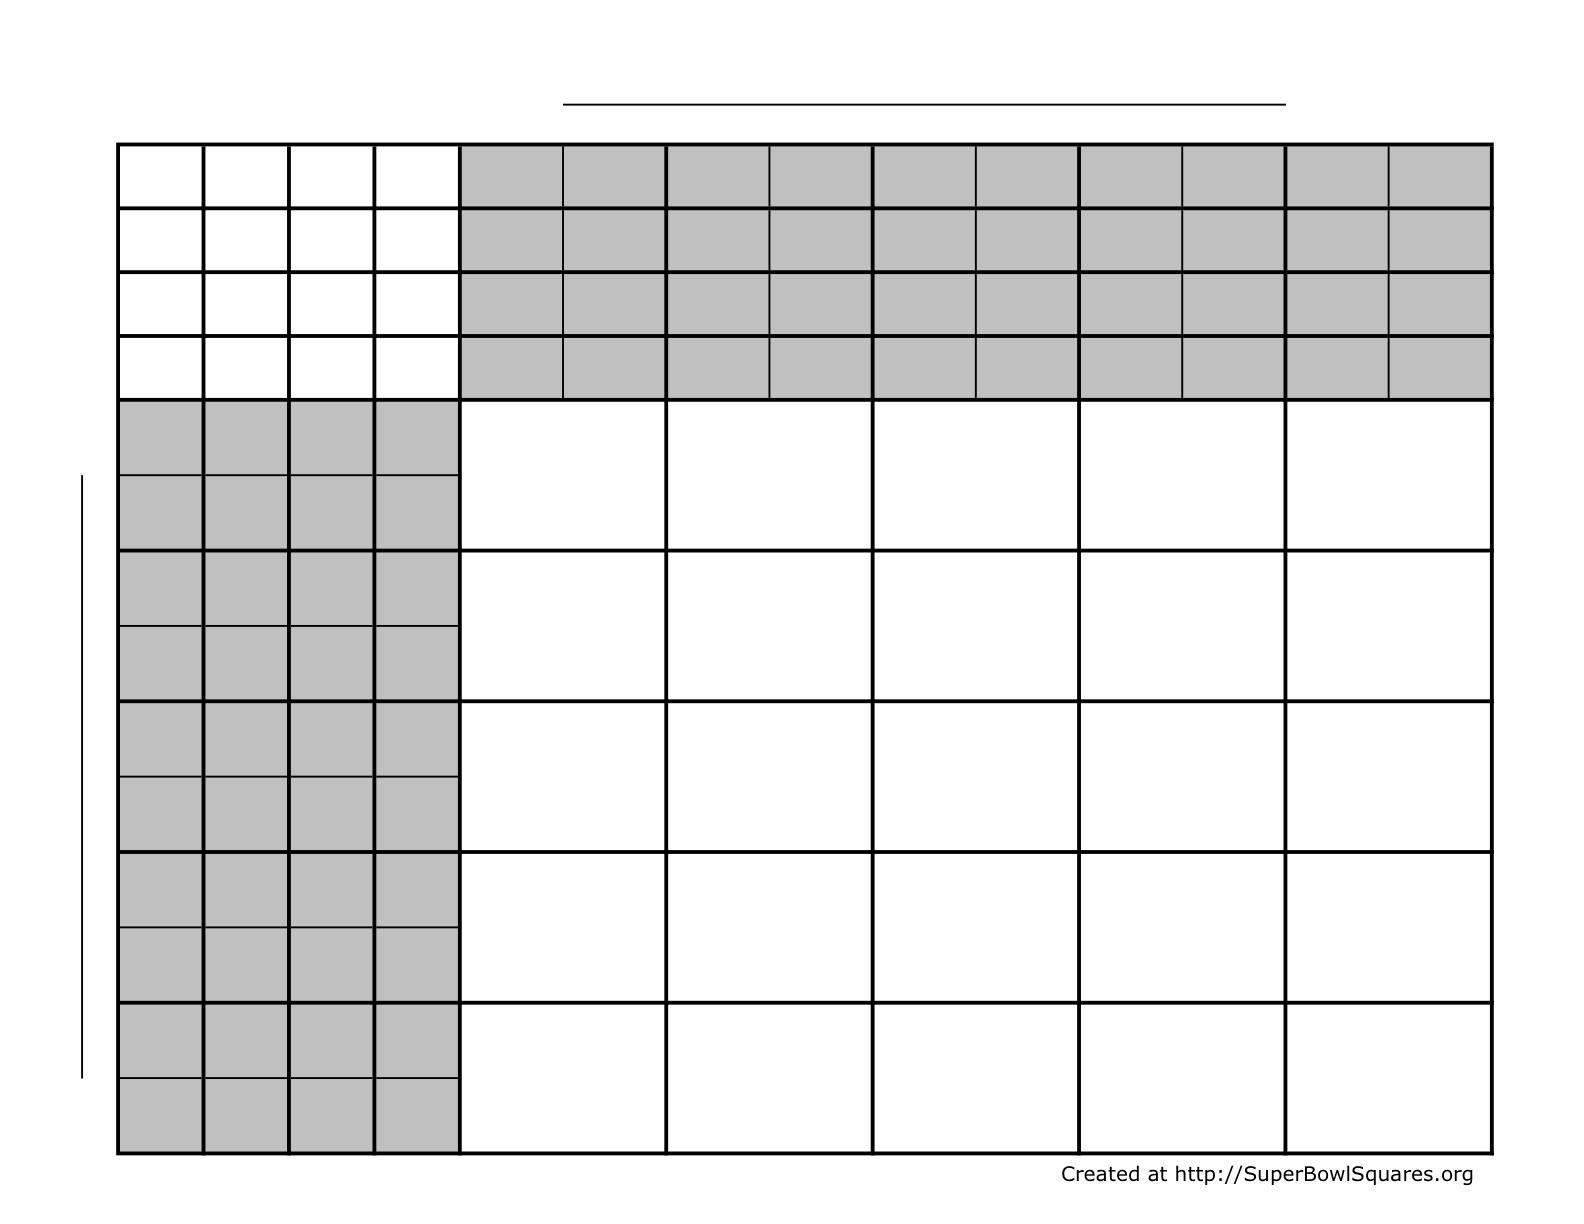 Free Football Pontoon Spreadsheet Pertaining To Football Squares  Super Bowl Squares  Play Football Squares Online